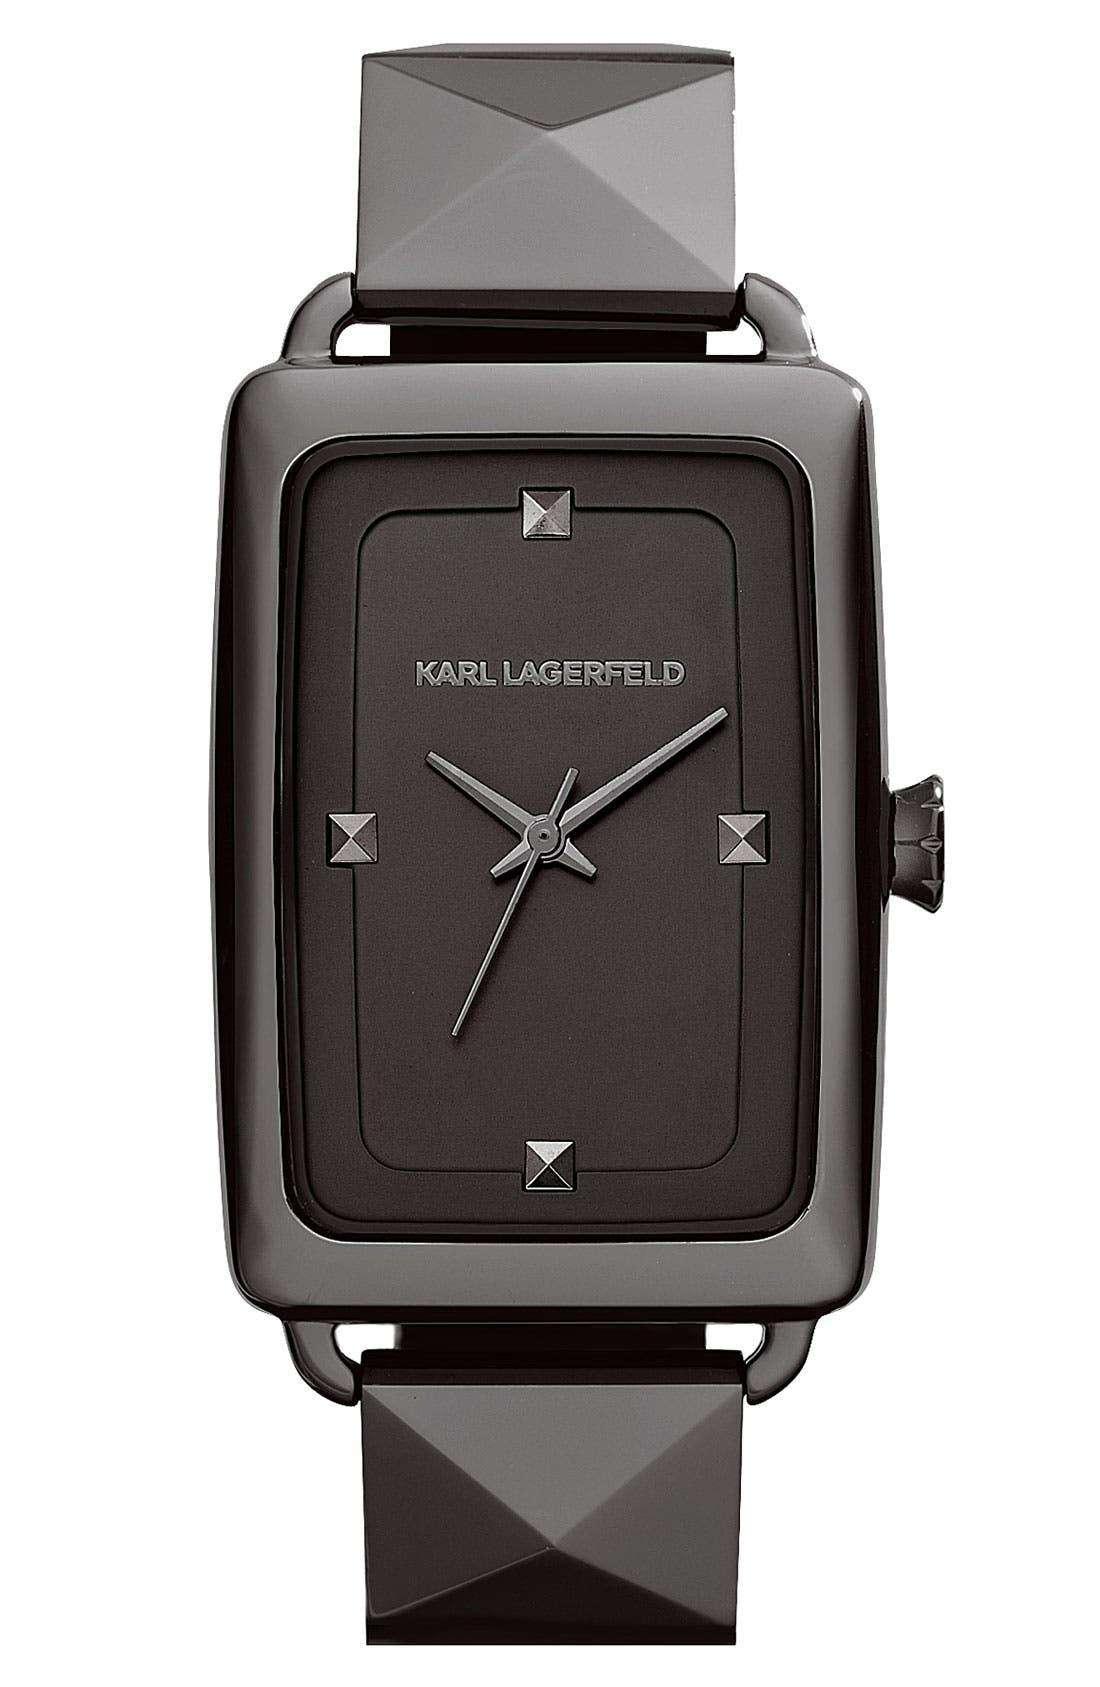 Main Image - KARL LAGERFELD 'Kourbe' Rectangular Bracelet Watch, 28mm x 41mm